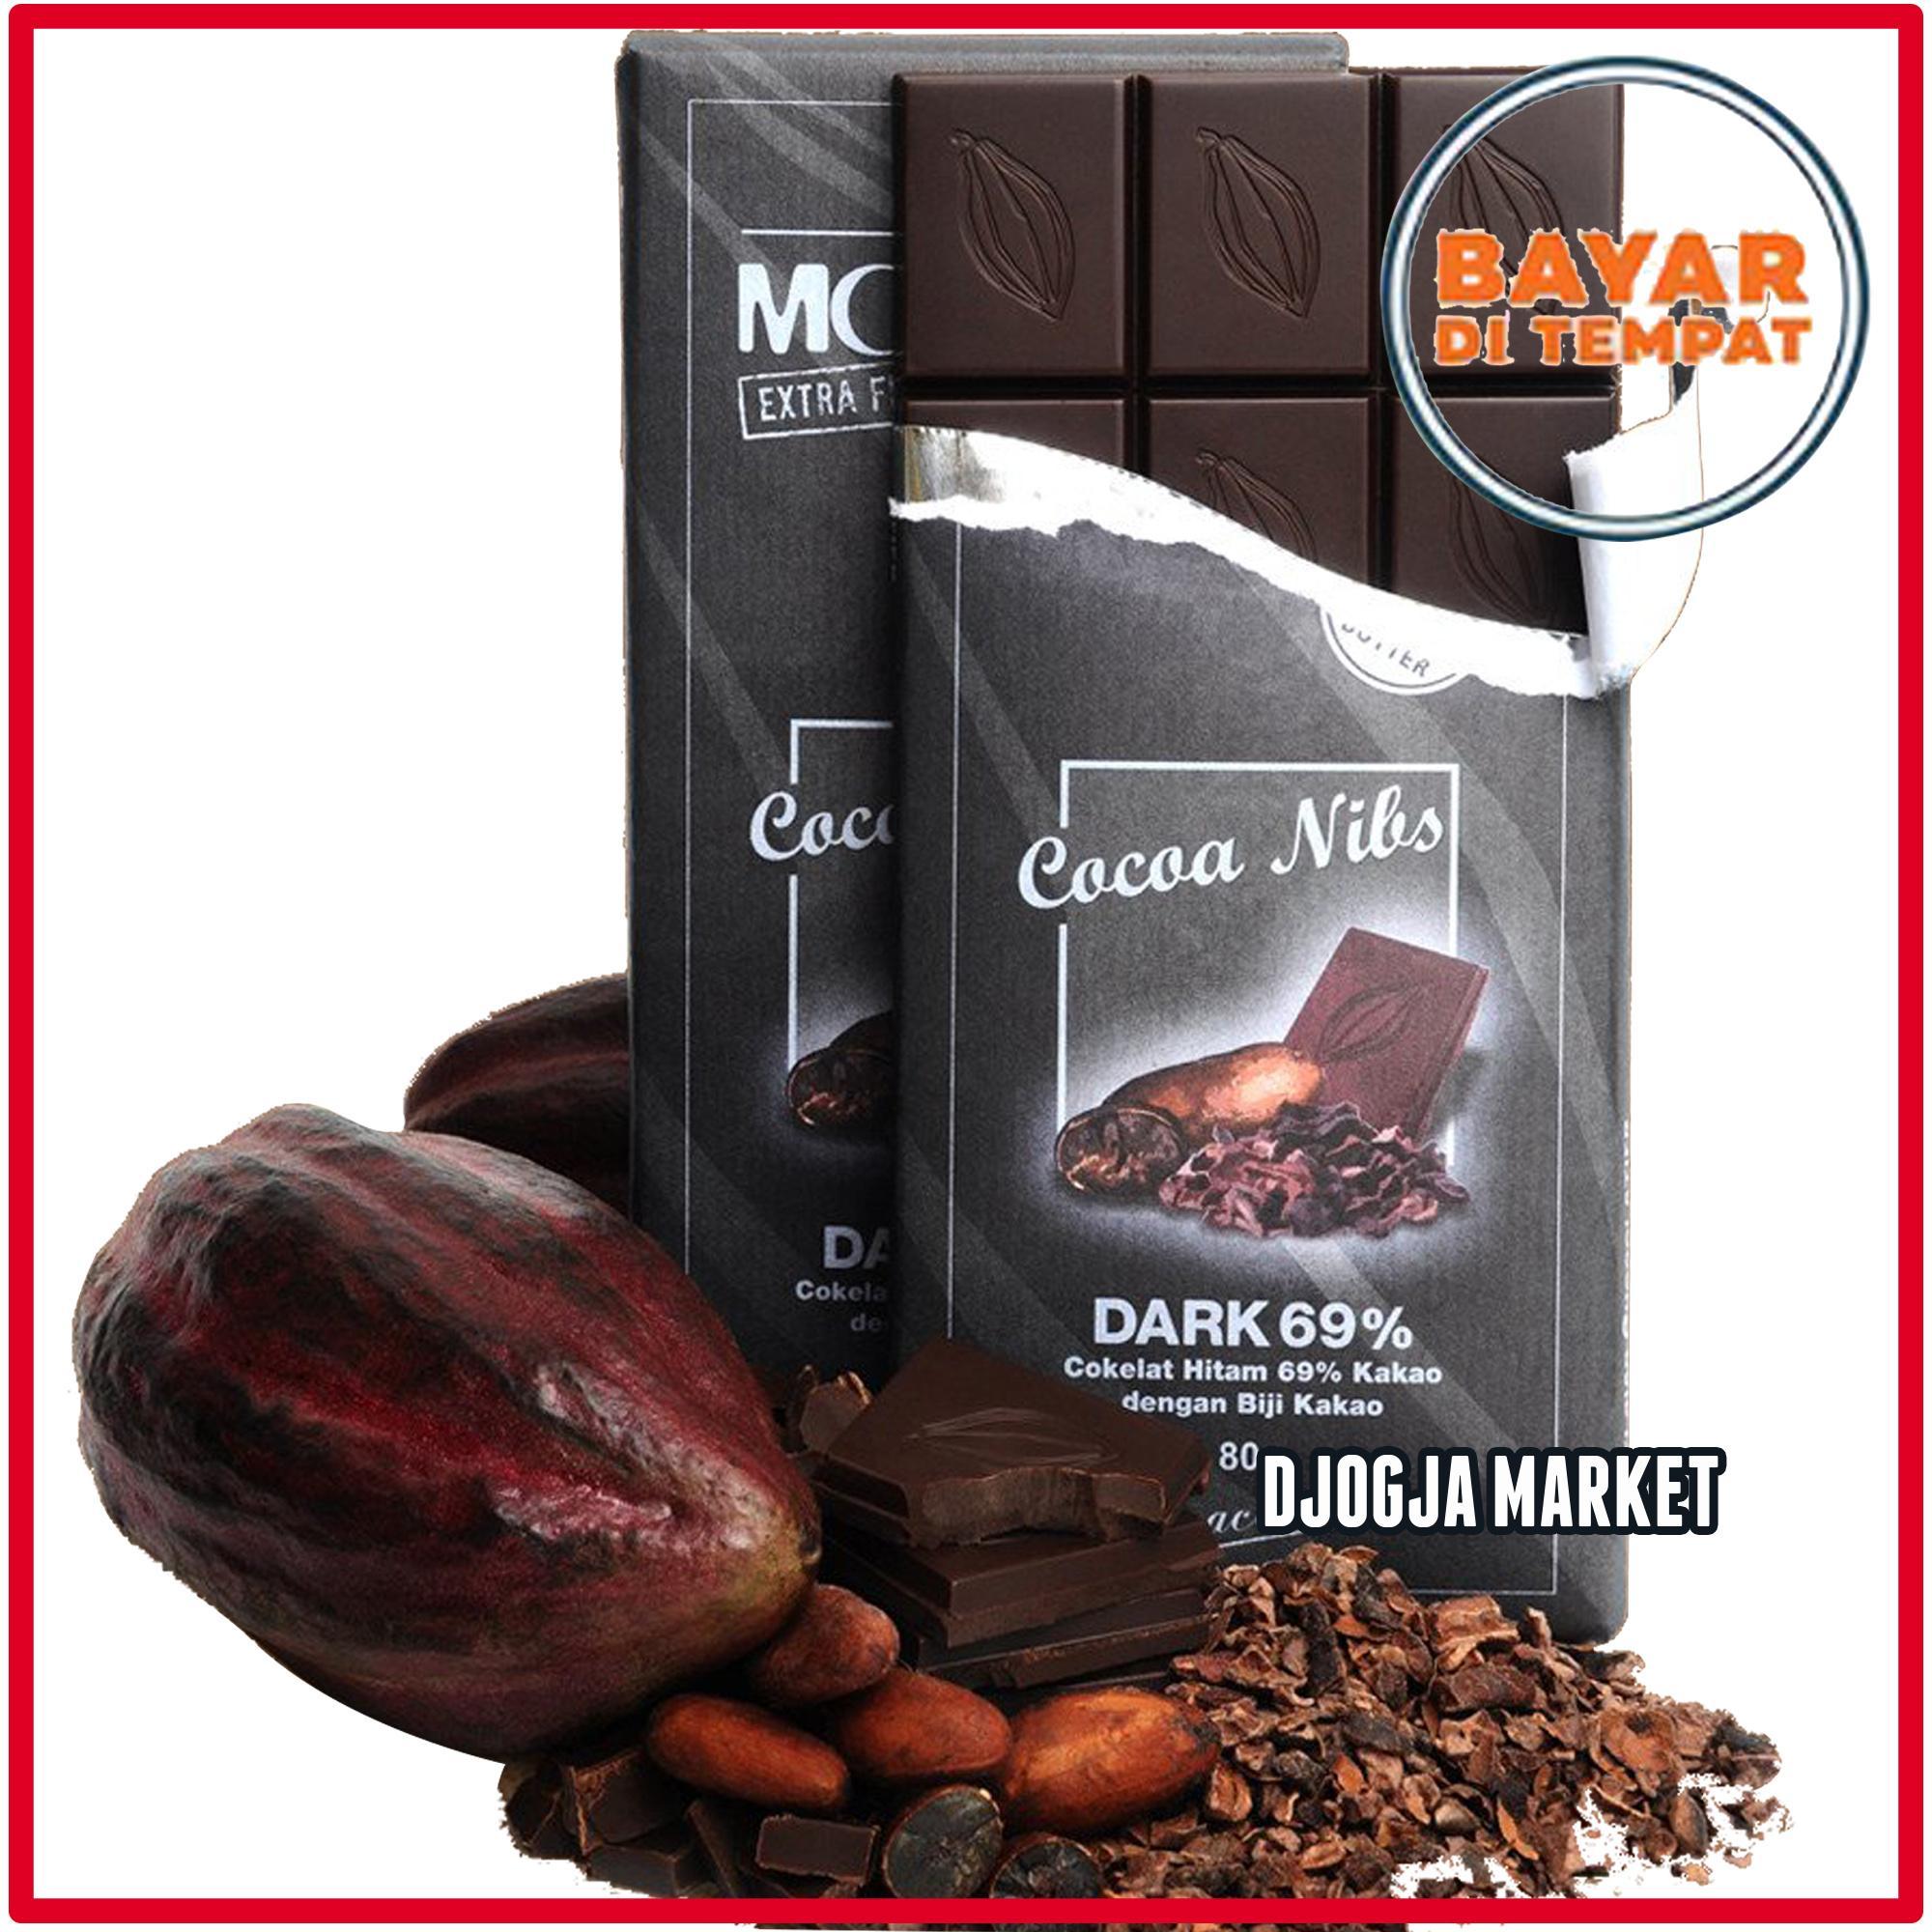 Djogja Market - Coklat Monggo Rasa Cocoa Nibs dengan remahan biji coklat di dalam